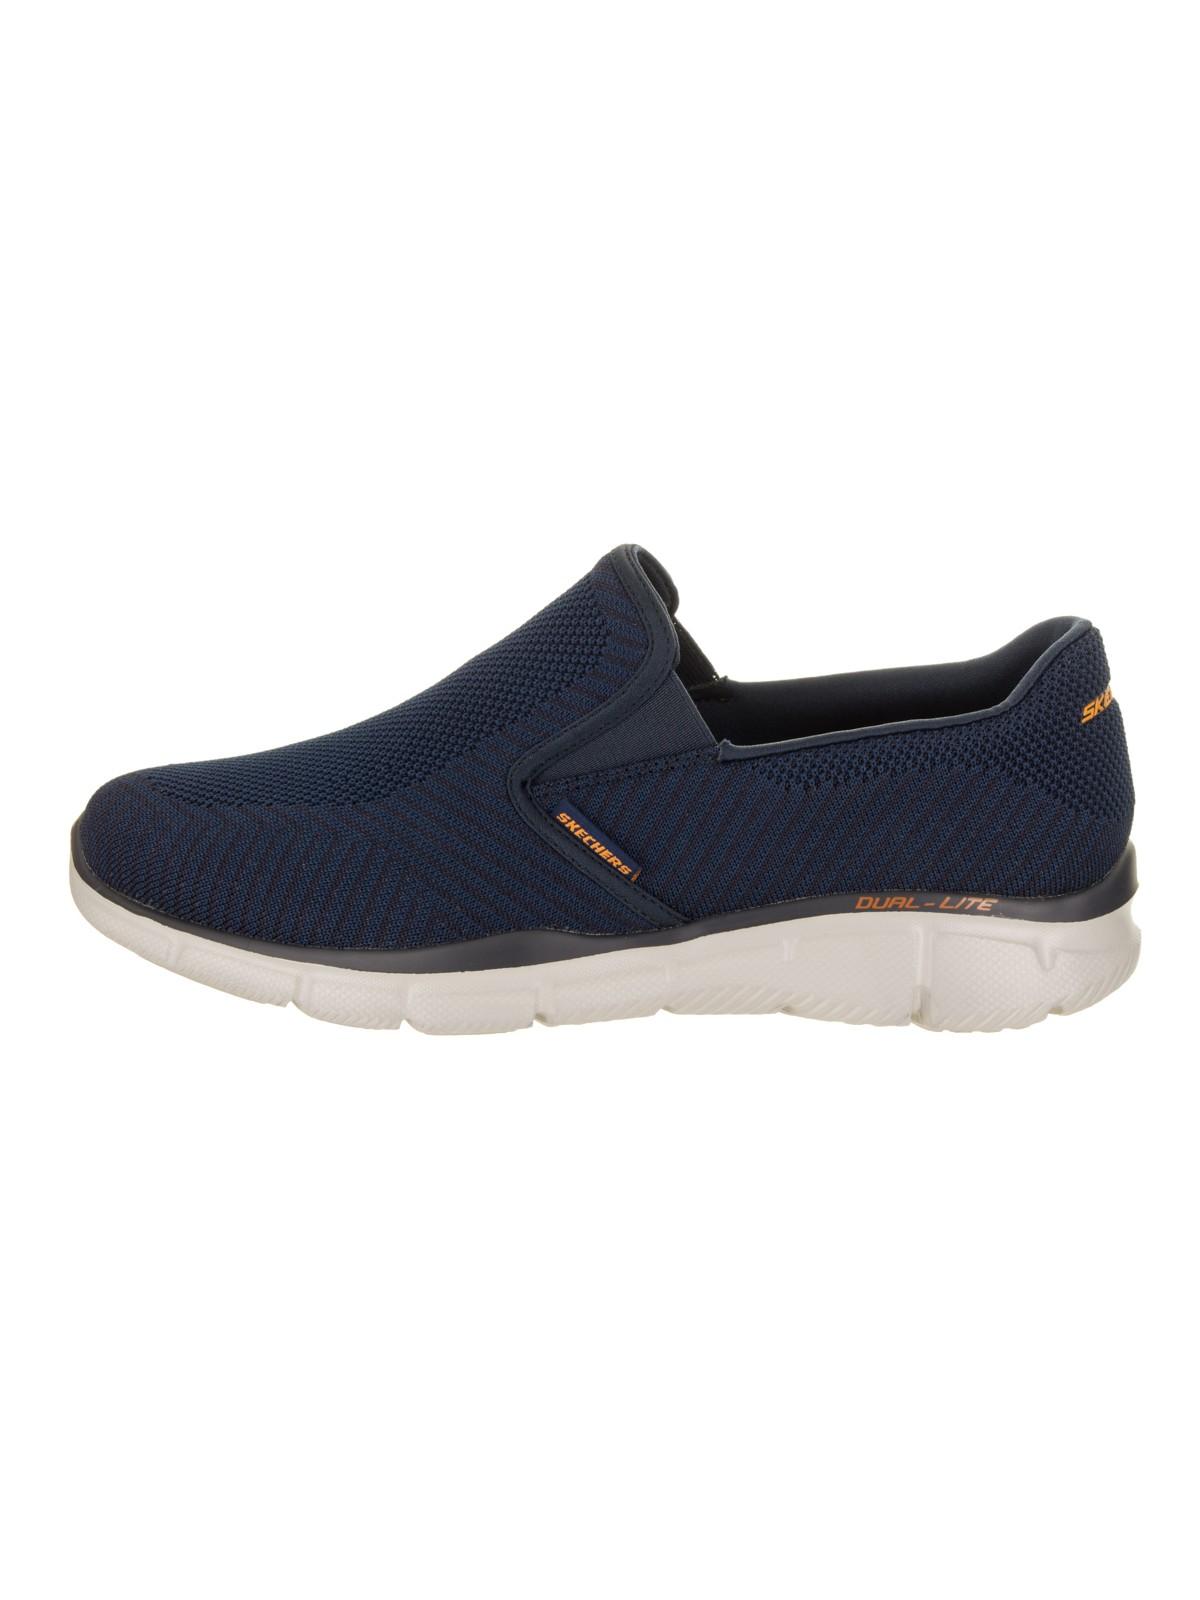 Skechers Men's Equalizer - Okwara Casual Shoe